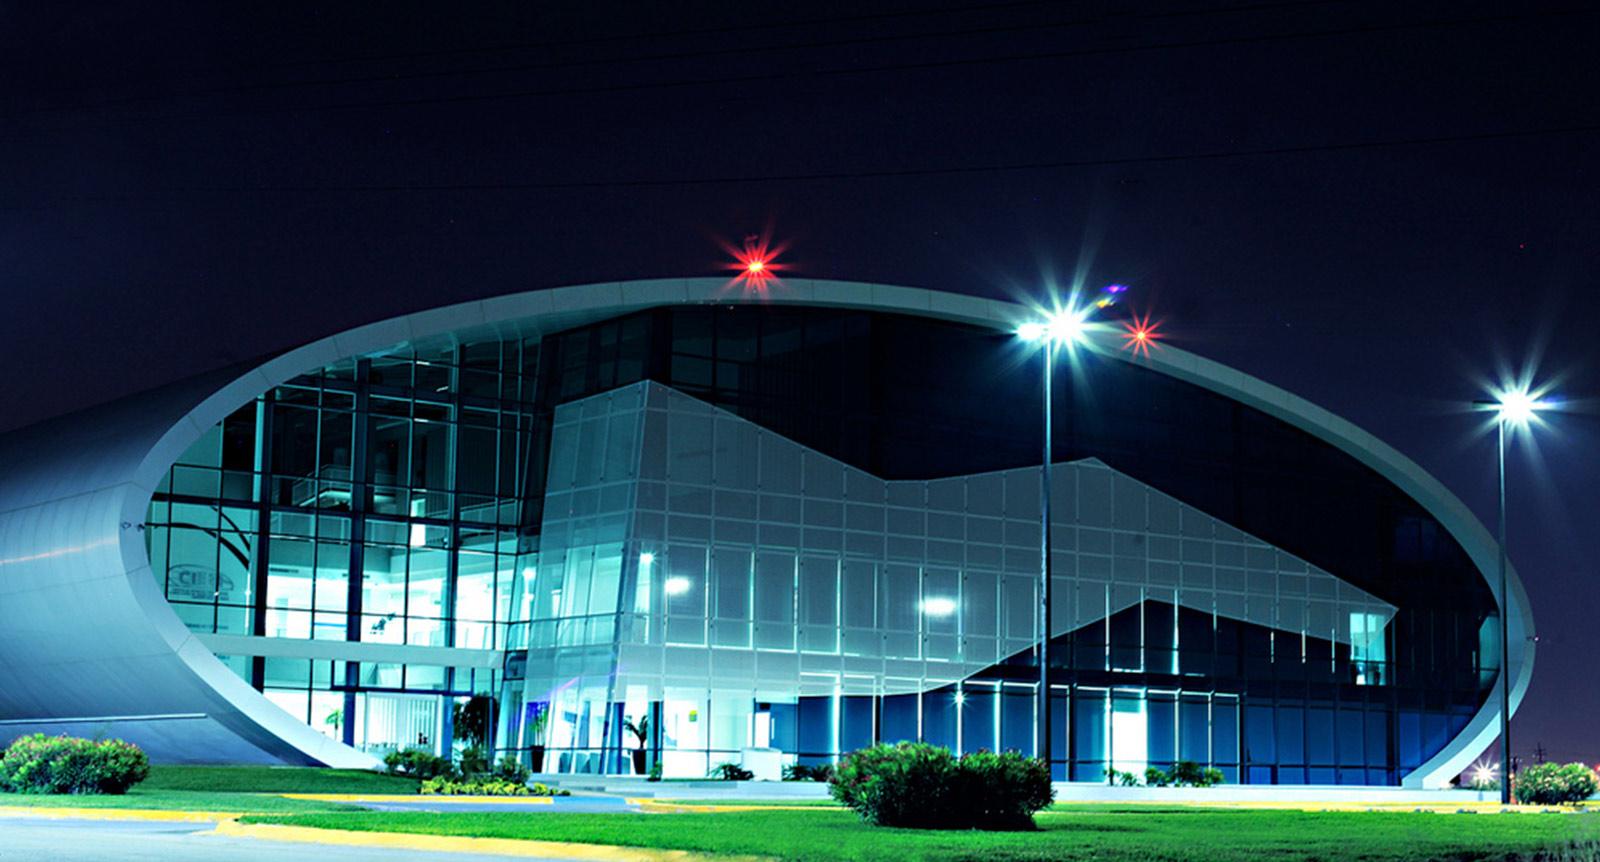 Centro de Investigación e Innovación en Ingeniería Aeronáutica (CIIIA)